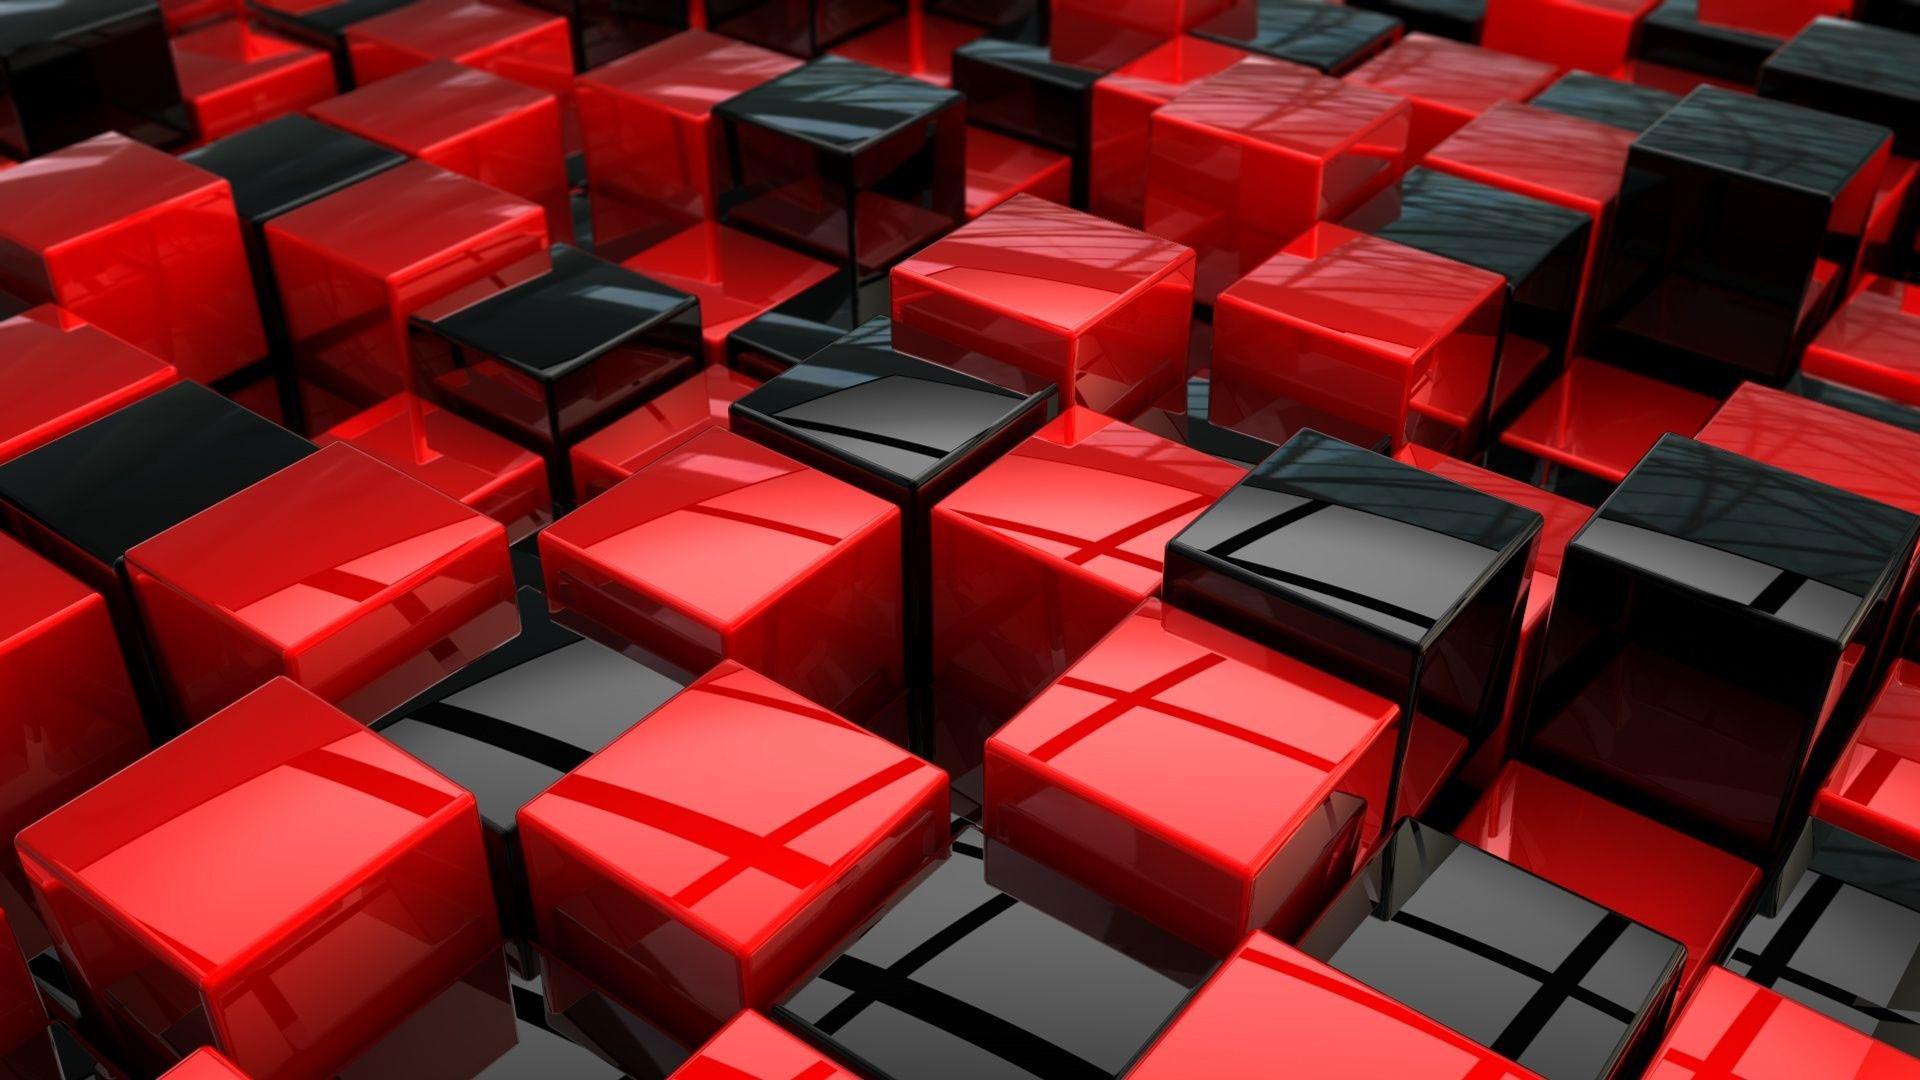 hd pics photos red and black 3d cubes desktop background wallpaper